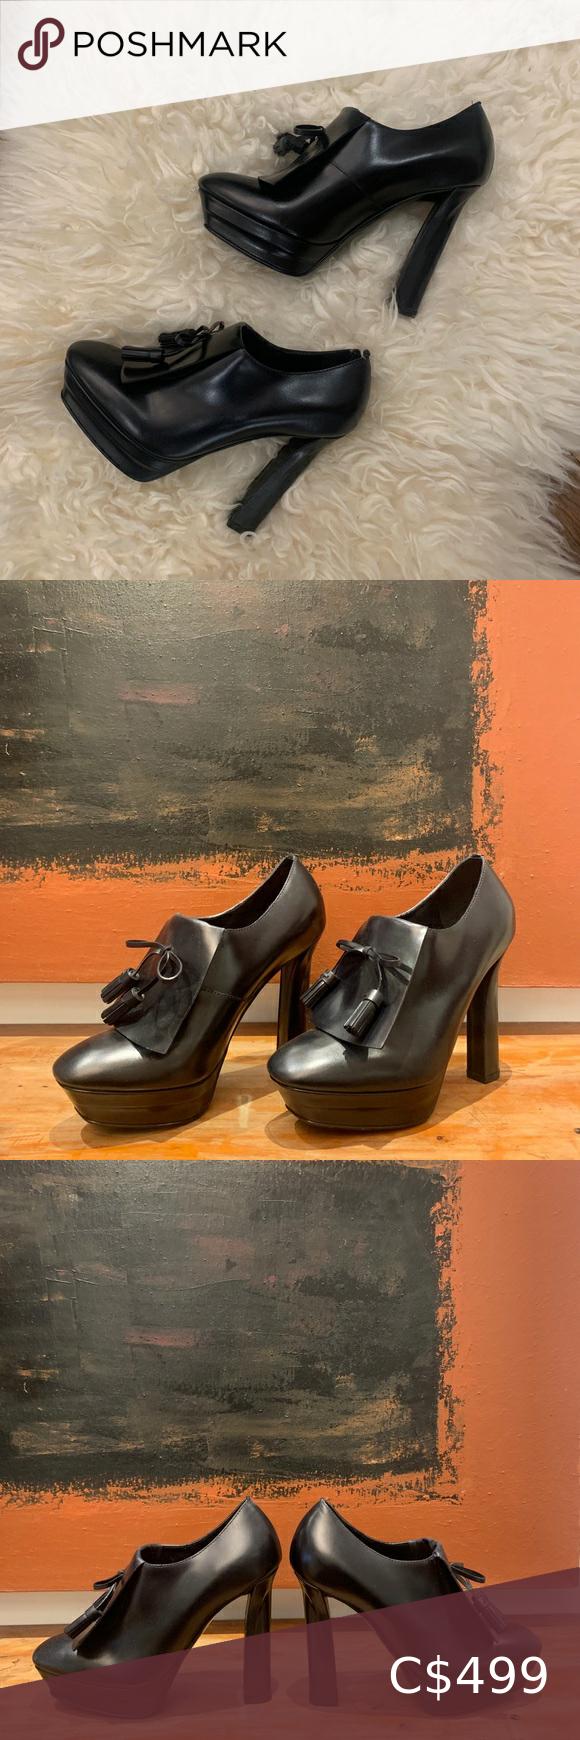 Bottega Veneta Leather Pre-owned Scarpa Pelle S.gomma